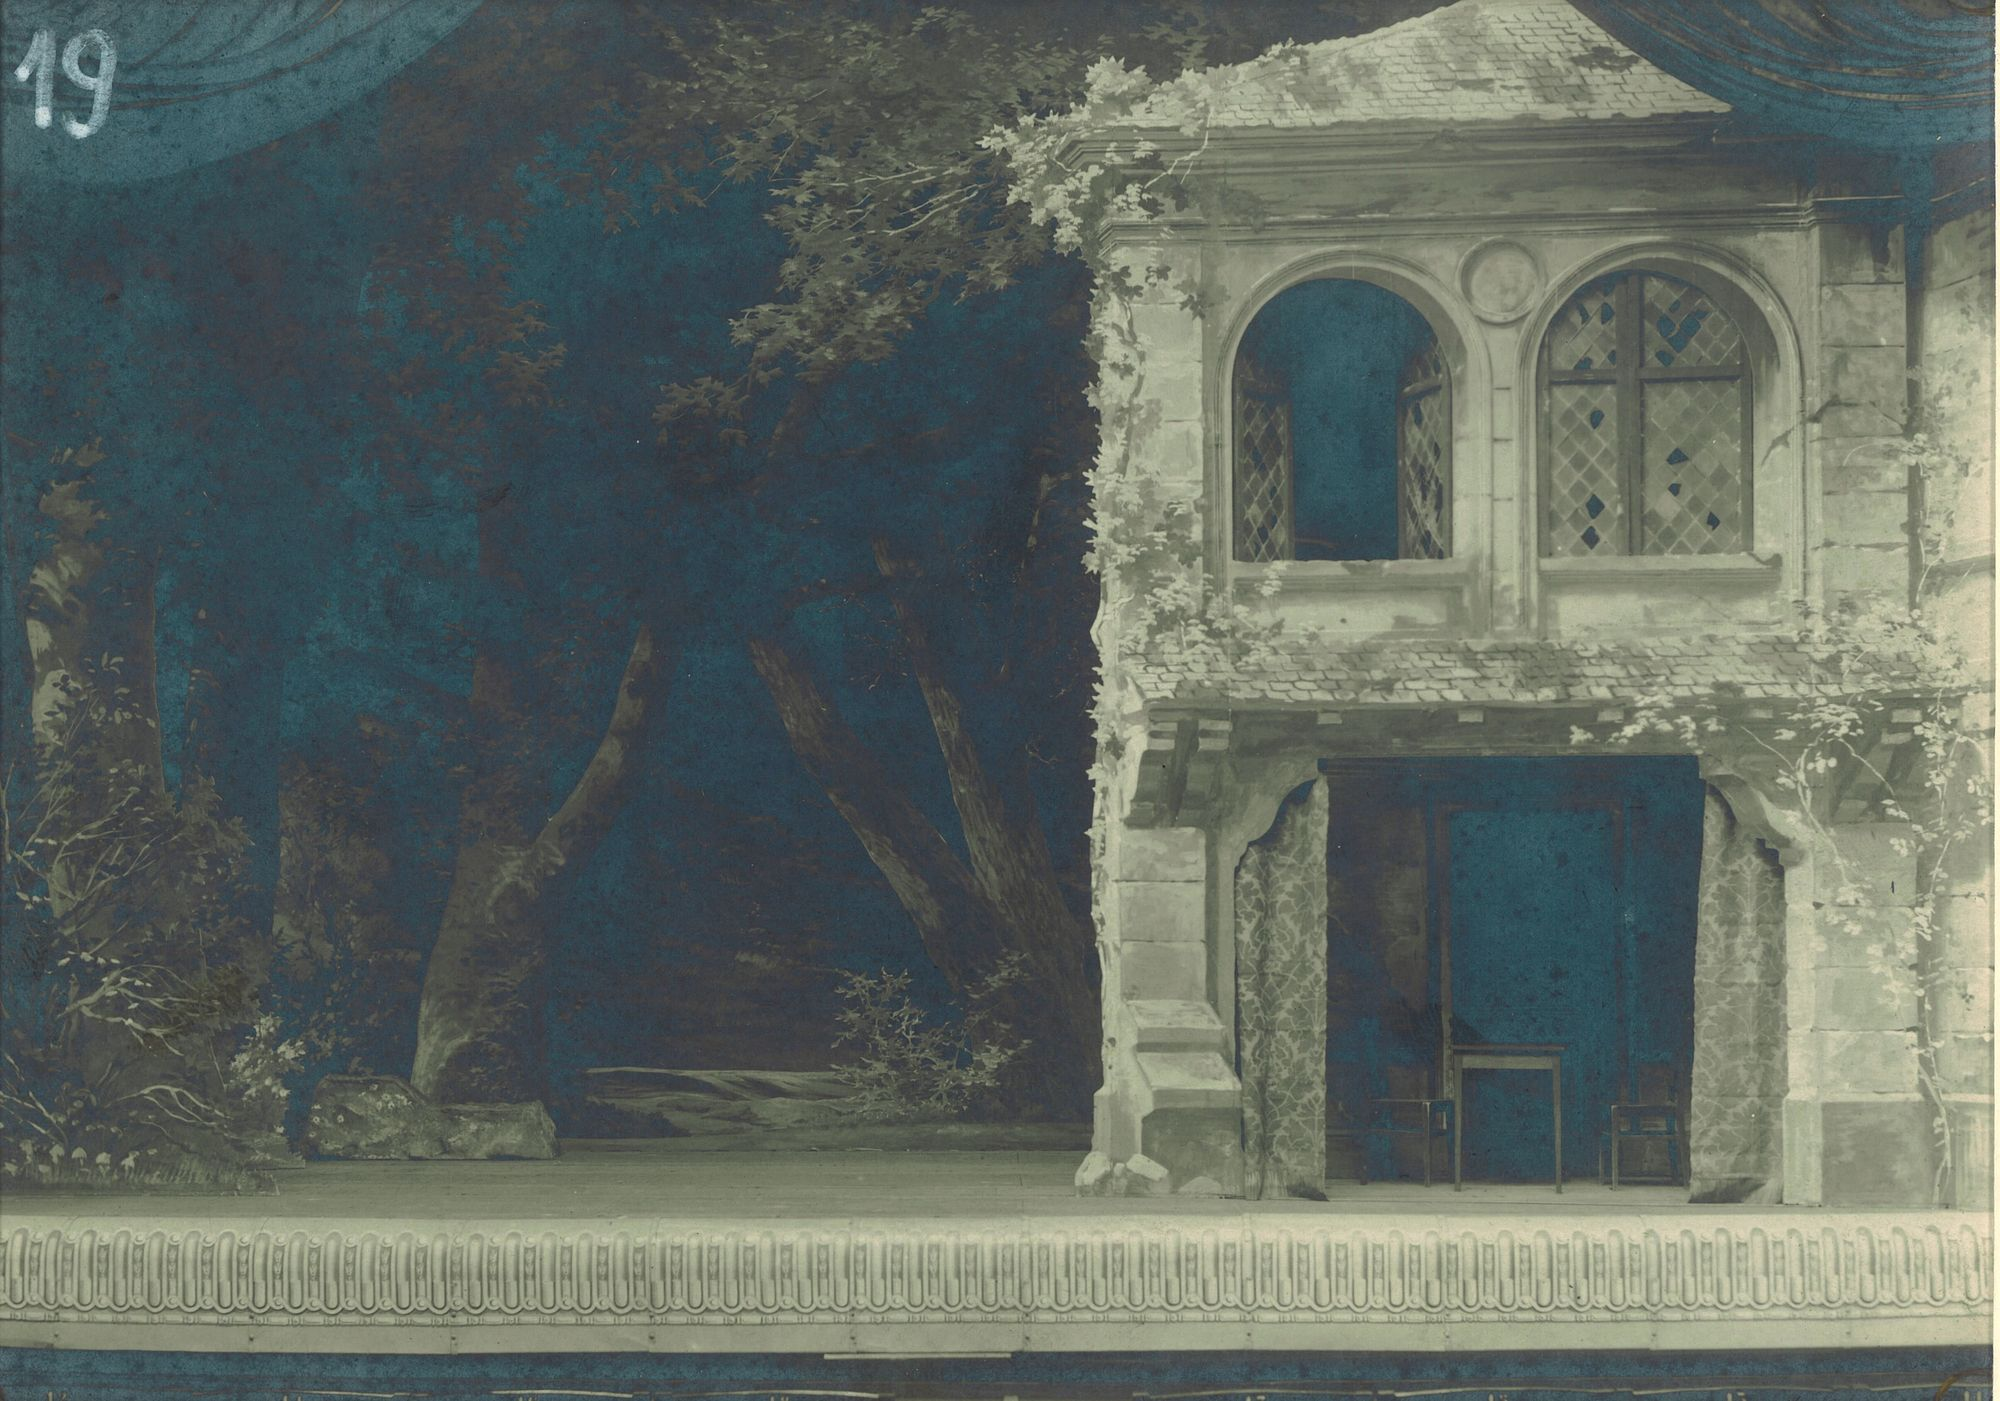 Maison Rigoletto